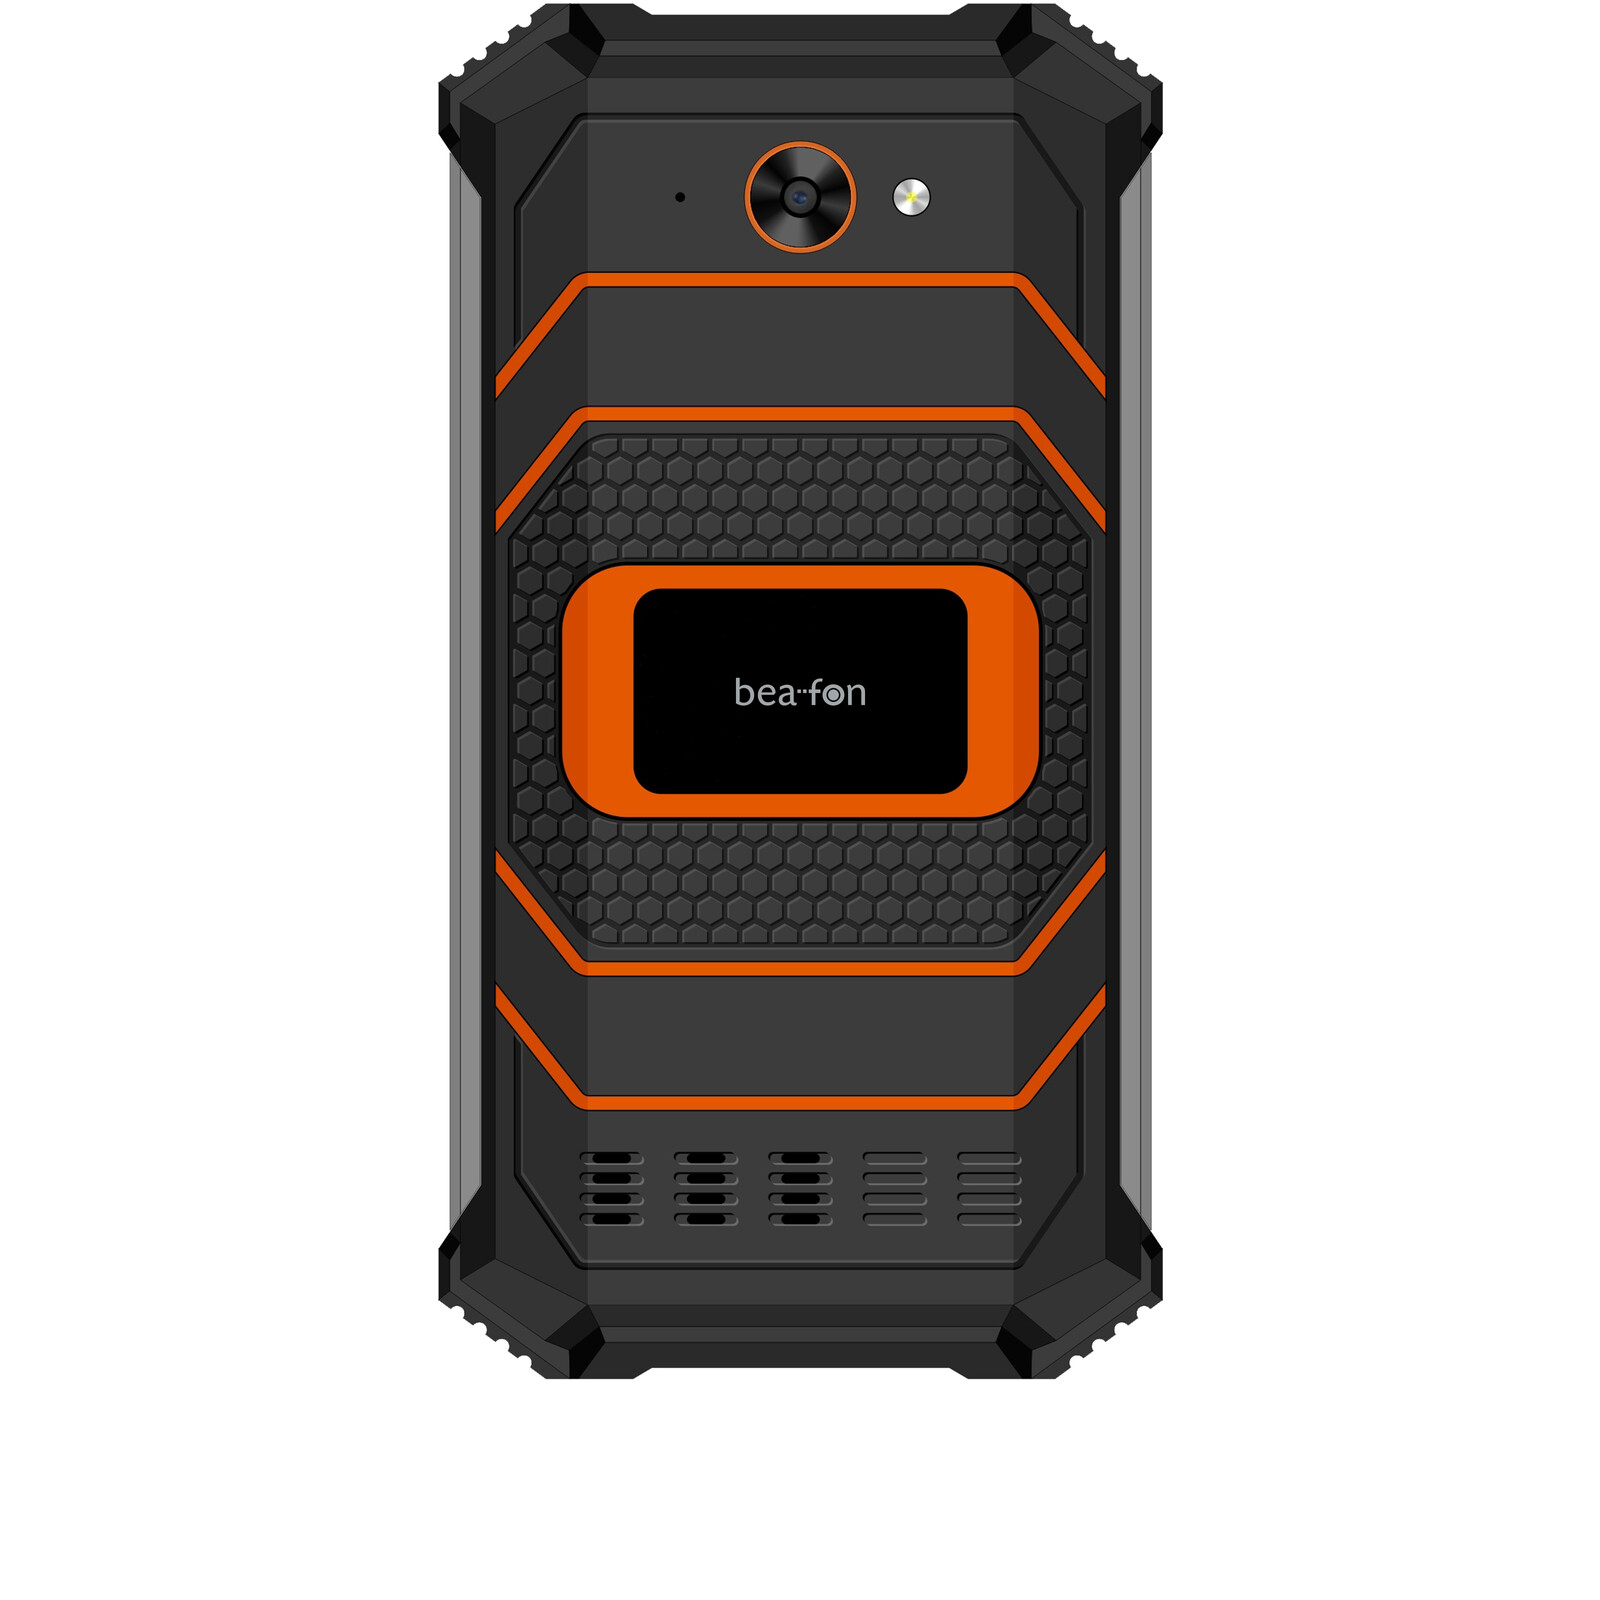 Beafon X5 schwarz/orange Outdoor-Smartphone